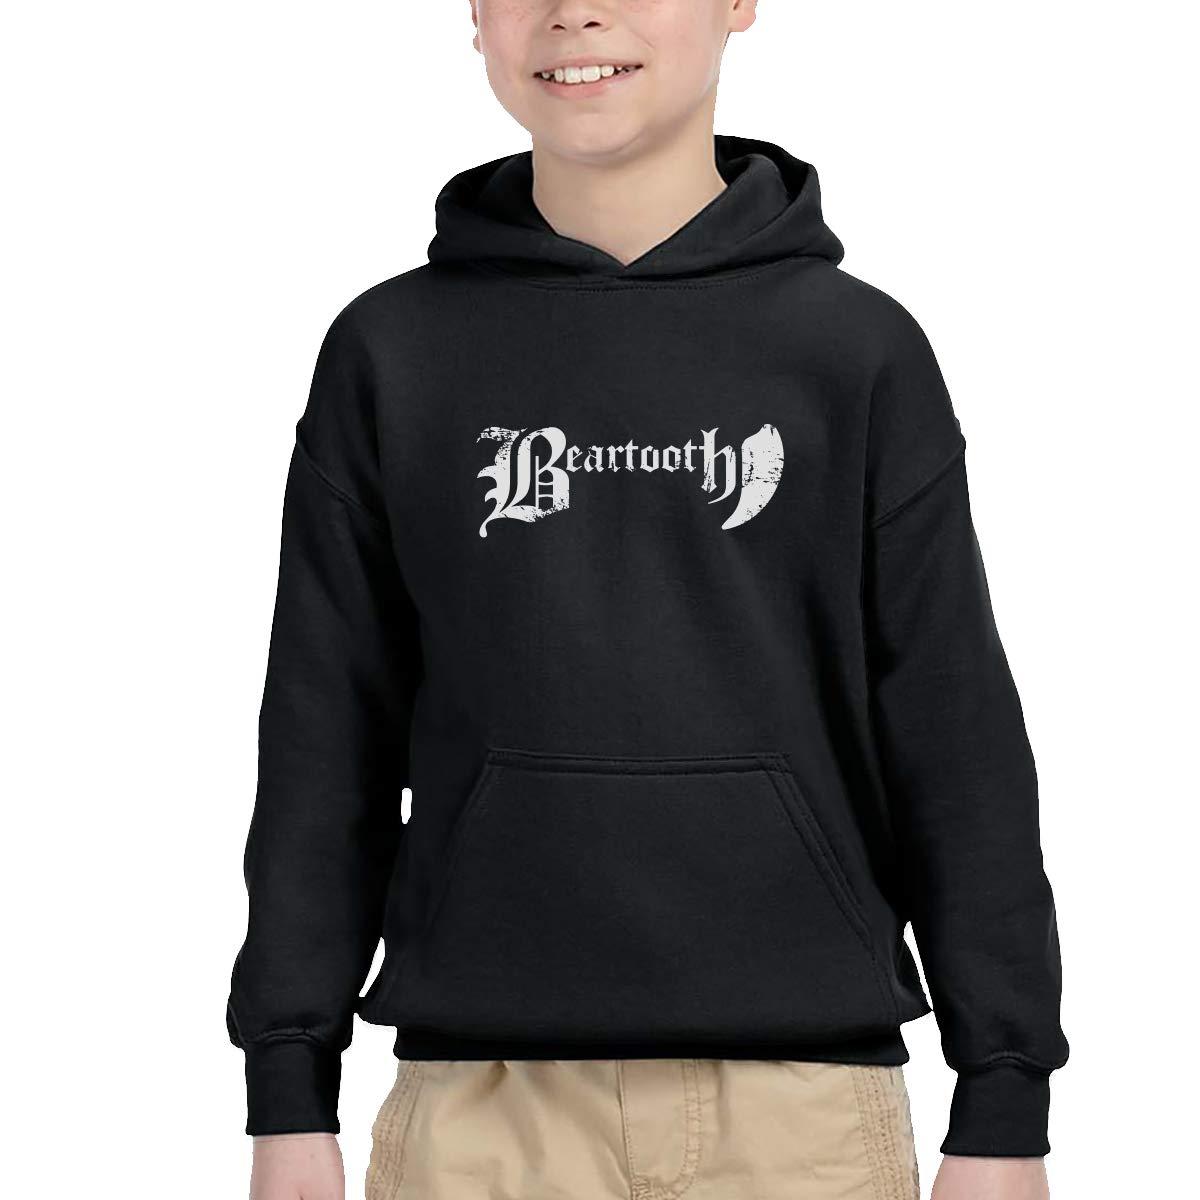 Beartooth Band Teenager Hip Hop Pullover Hoodie Sweater with Kangaroo Pocket Hooded Sweatshirts